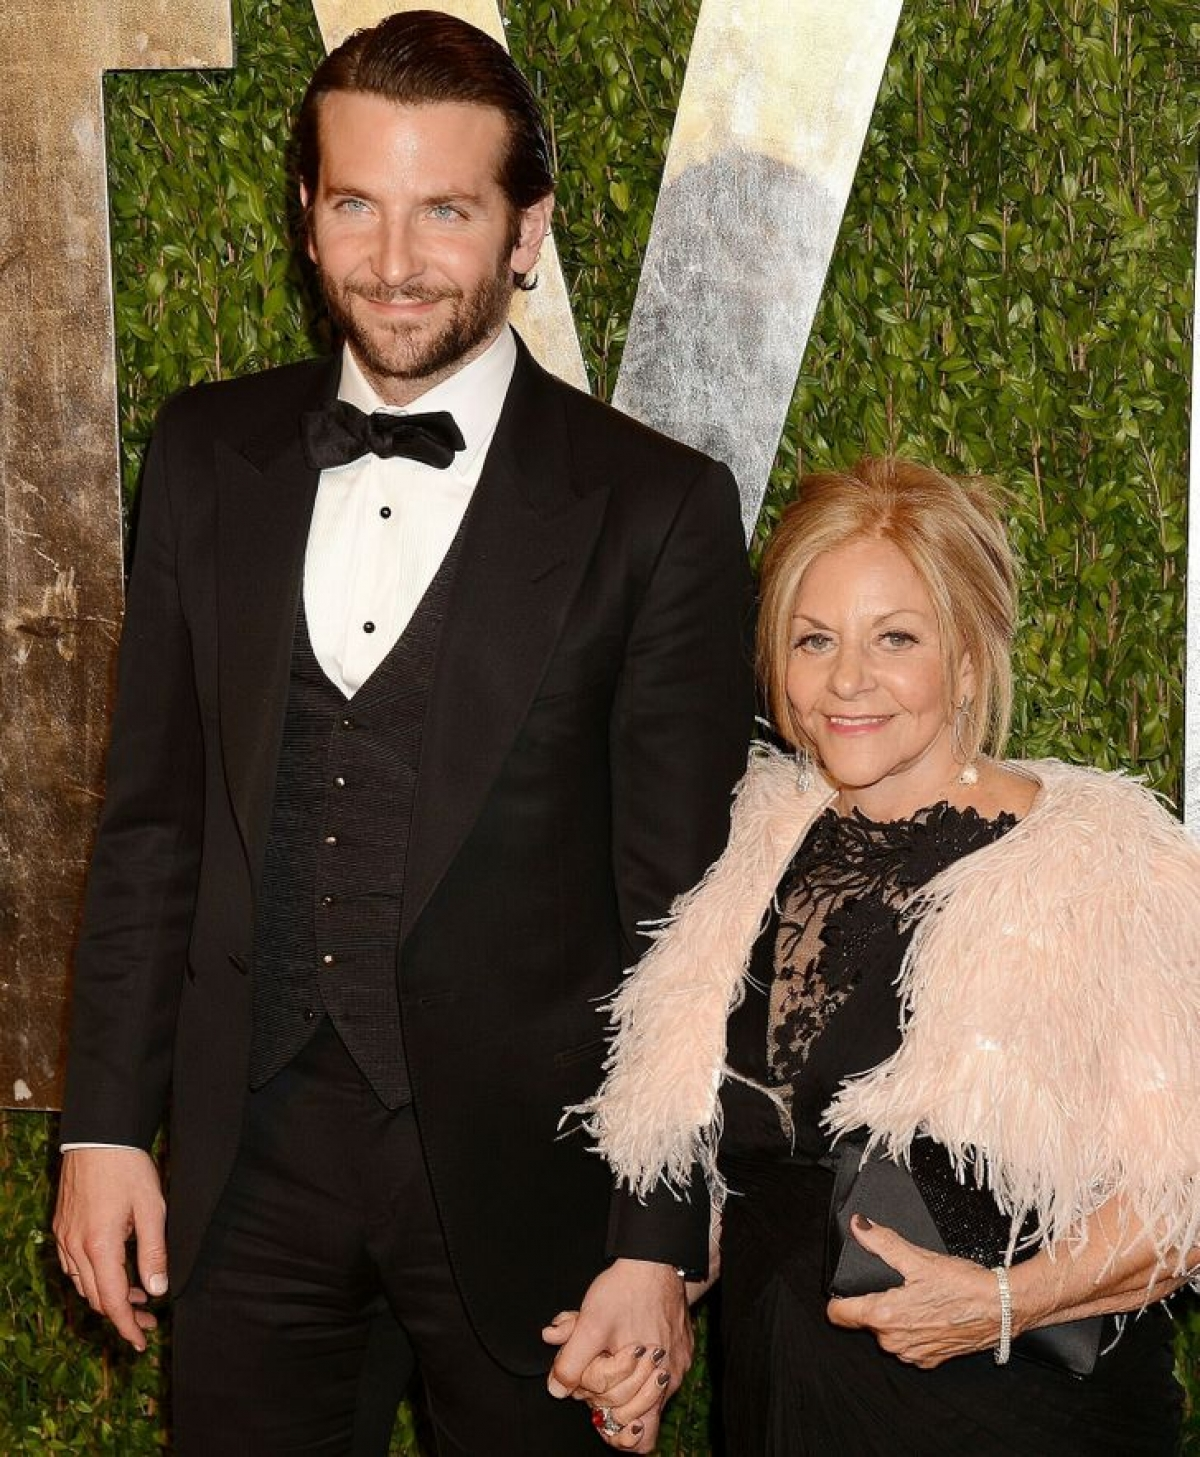 Bradley Cooper và Gloria Campano tại Vanity Fair Oscar Party năm 2013.